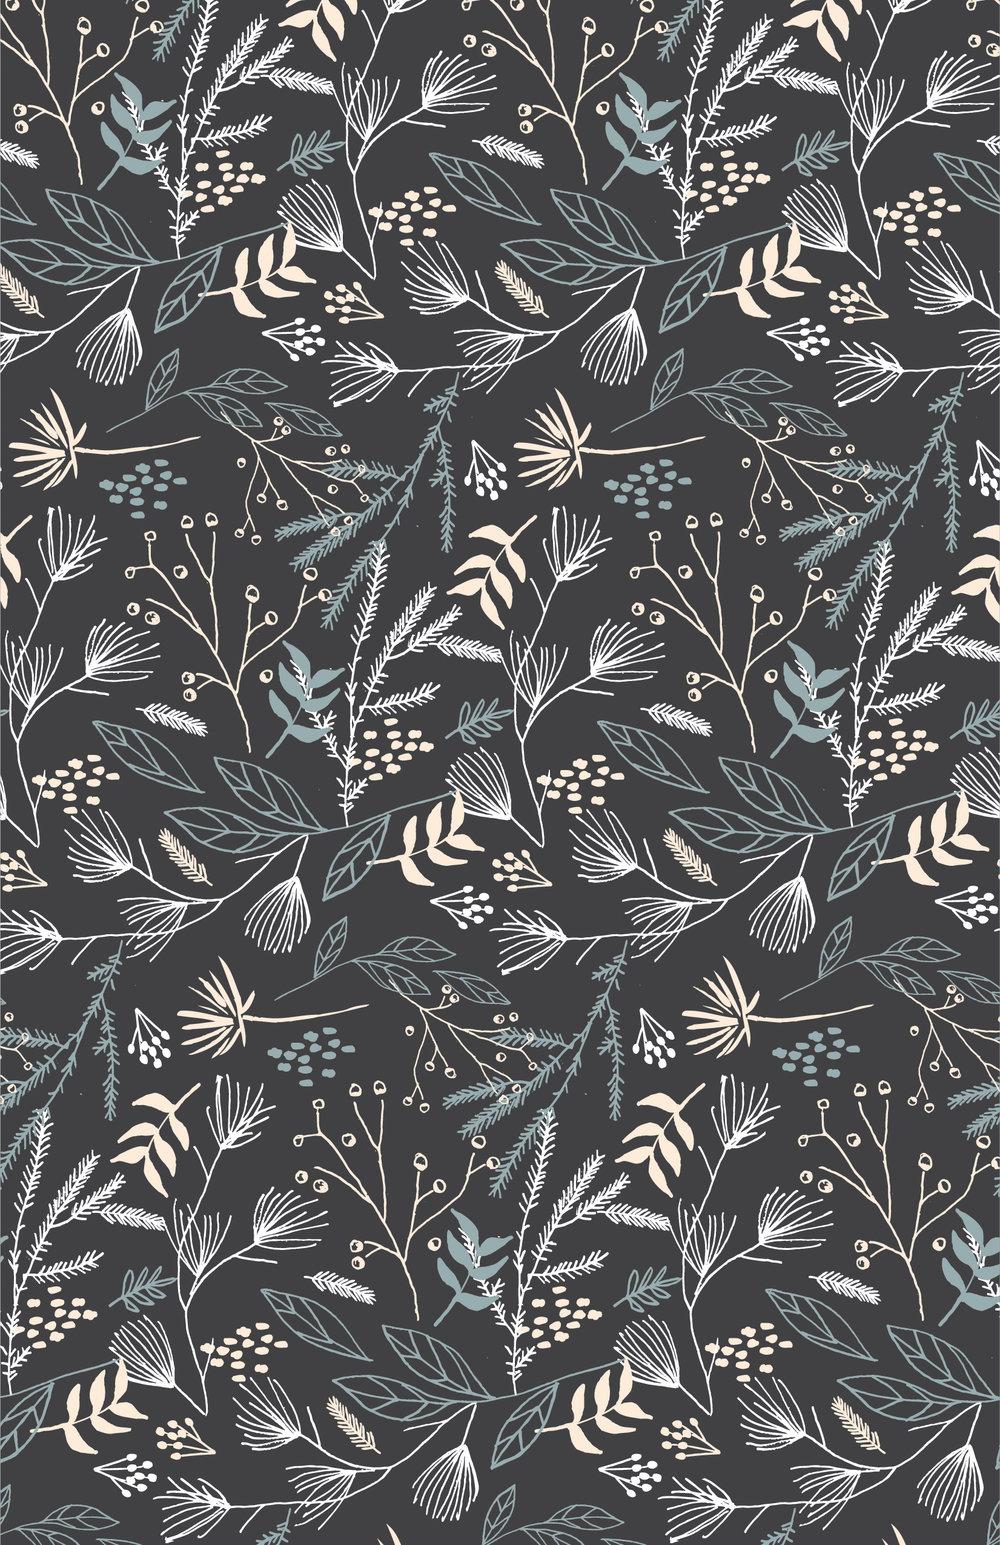 pattern43-01.jpg